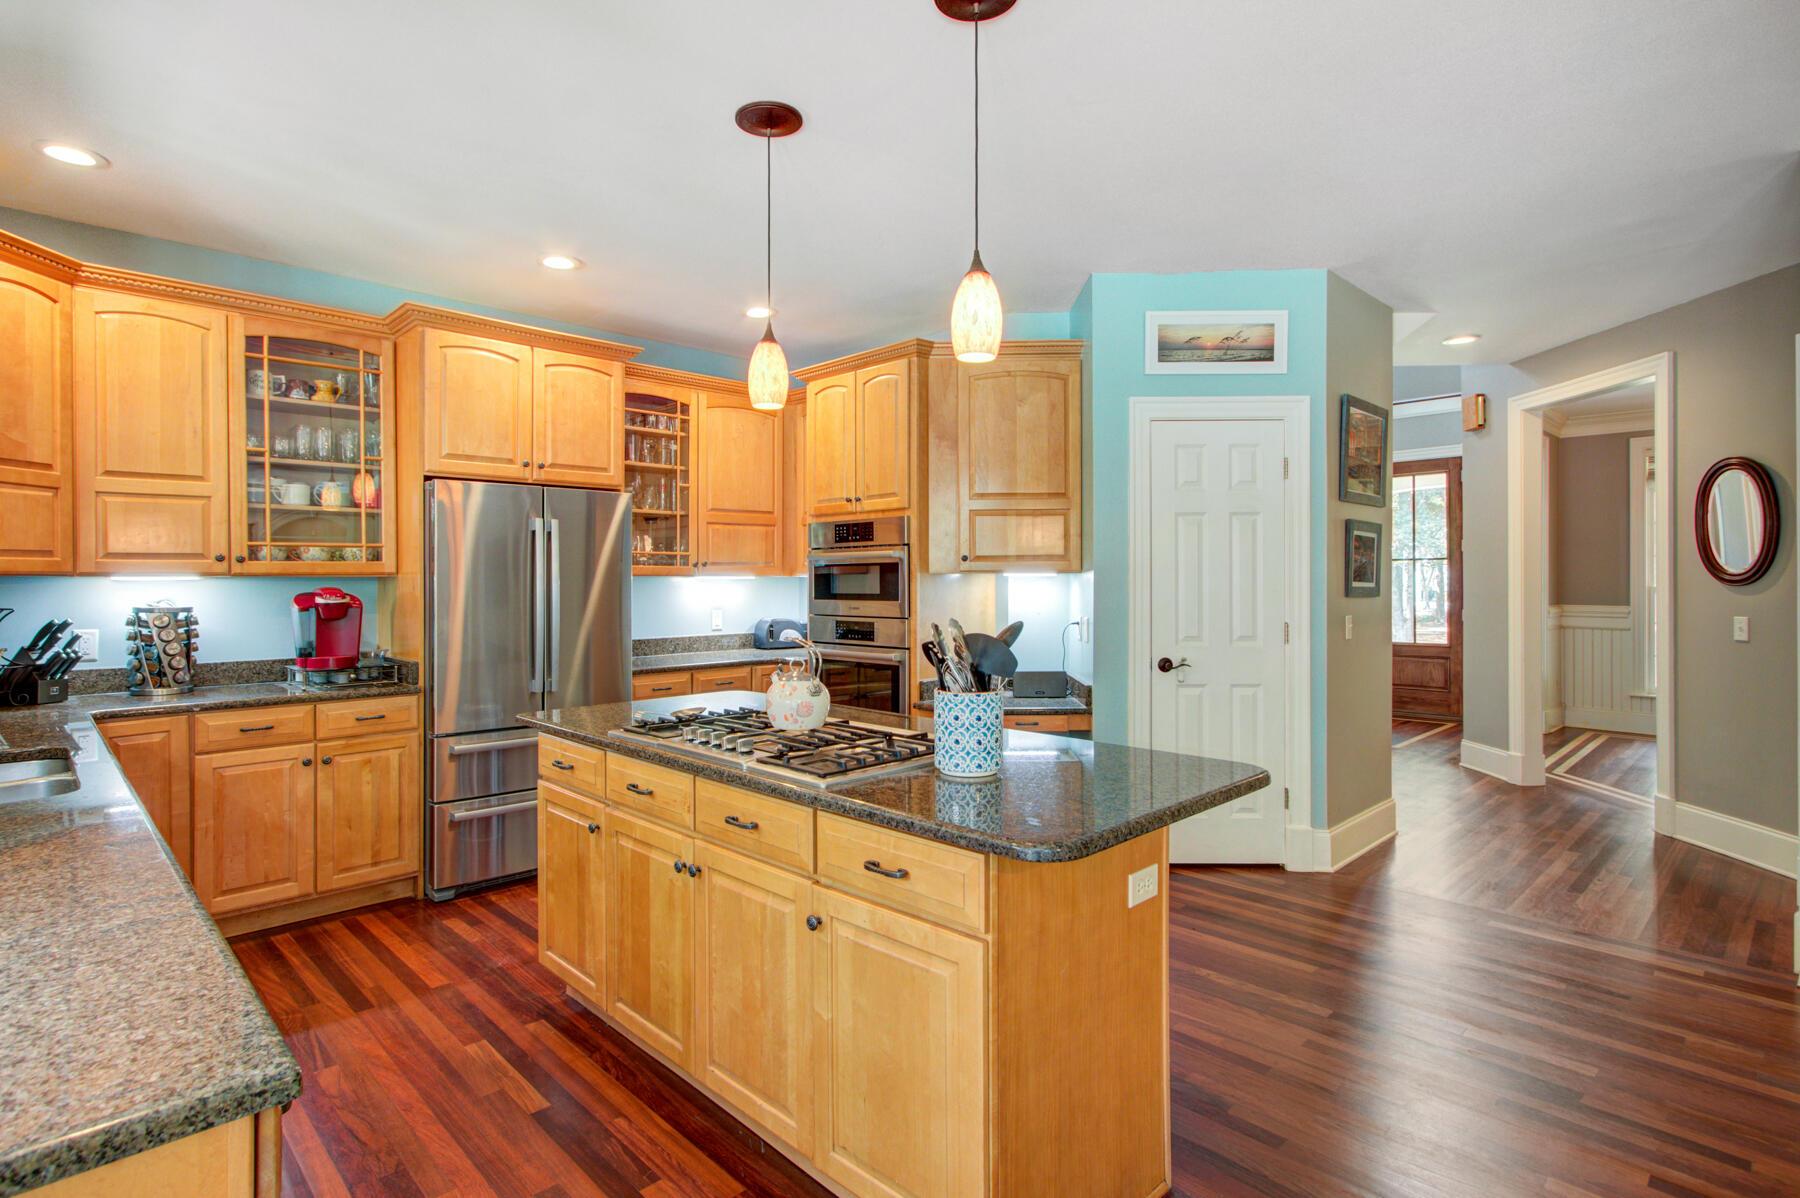 Dunes West Homes For Sale - 3095 Pignatelli, Mount Pleasant, SC - 15